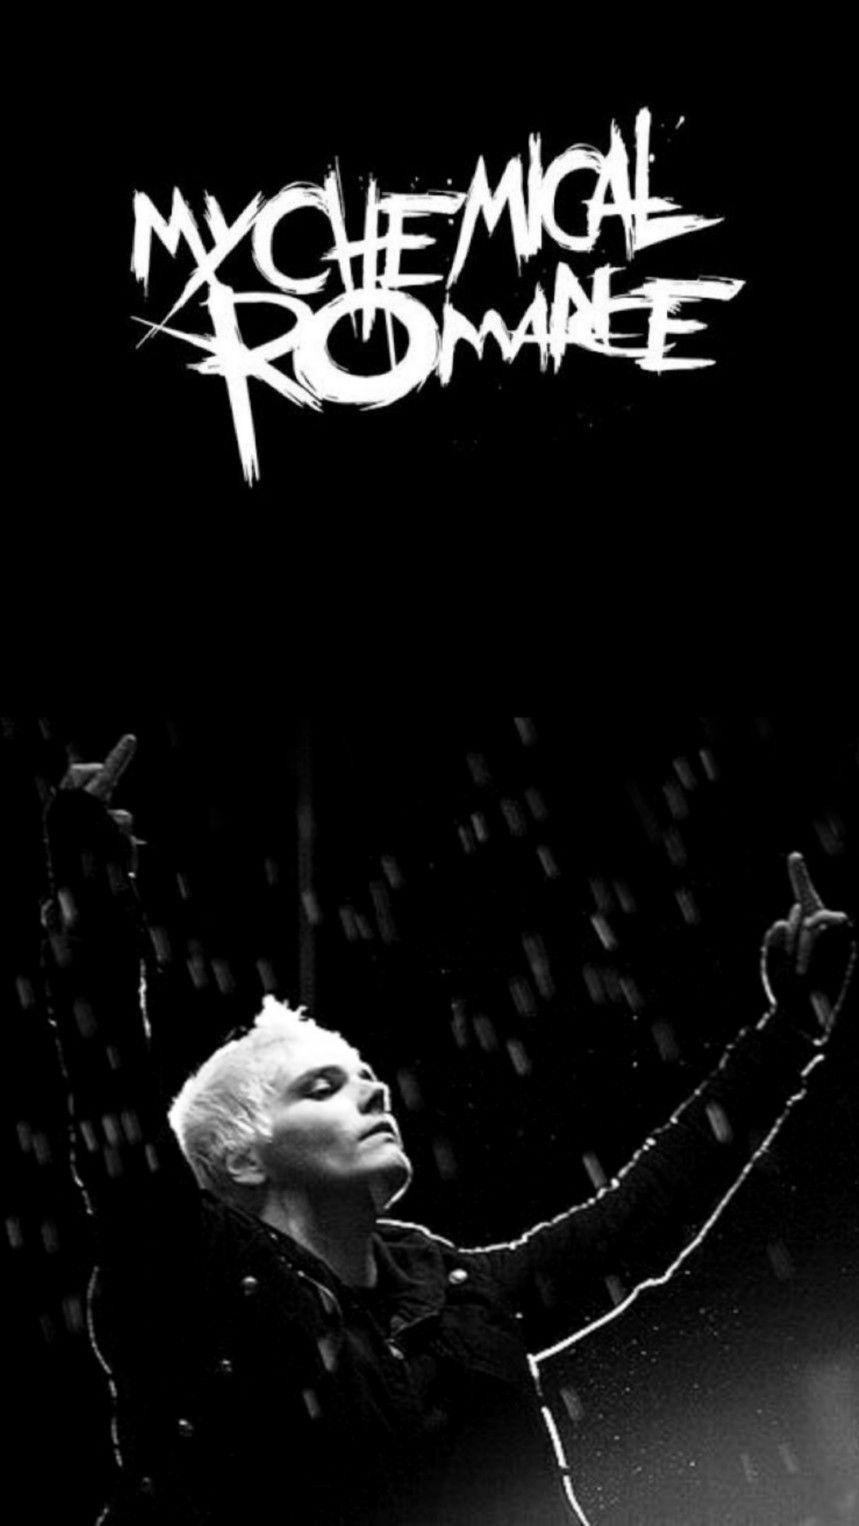 Mcr Wallpaper My Chemical Romance Mcr Emo Wallpaper